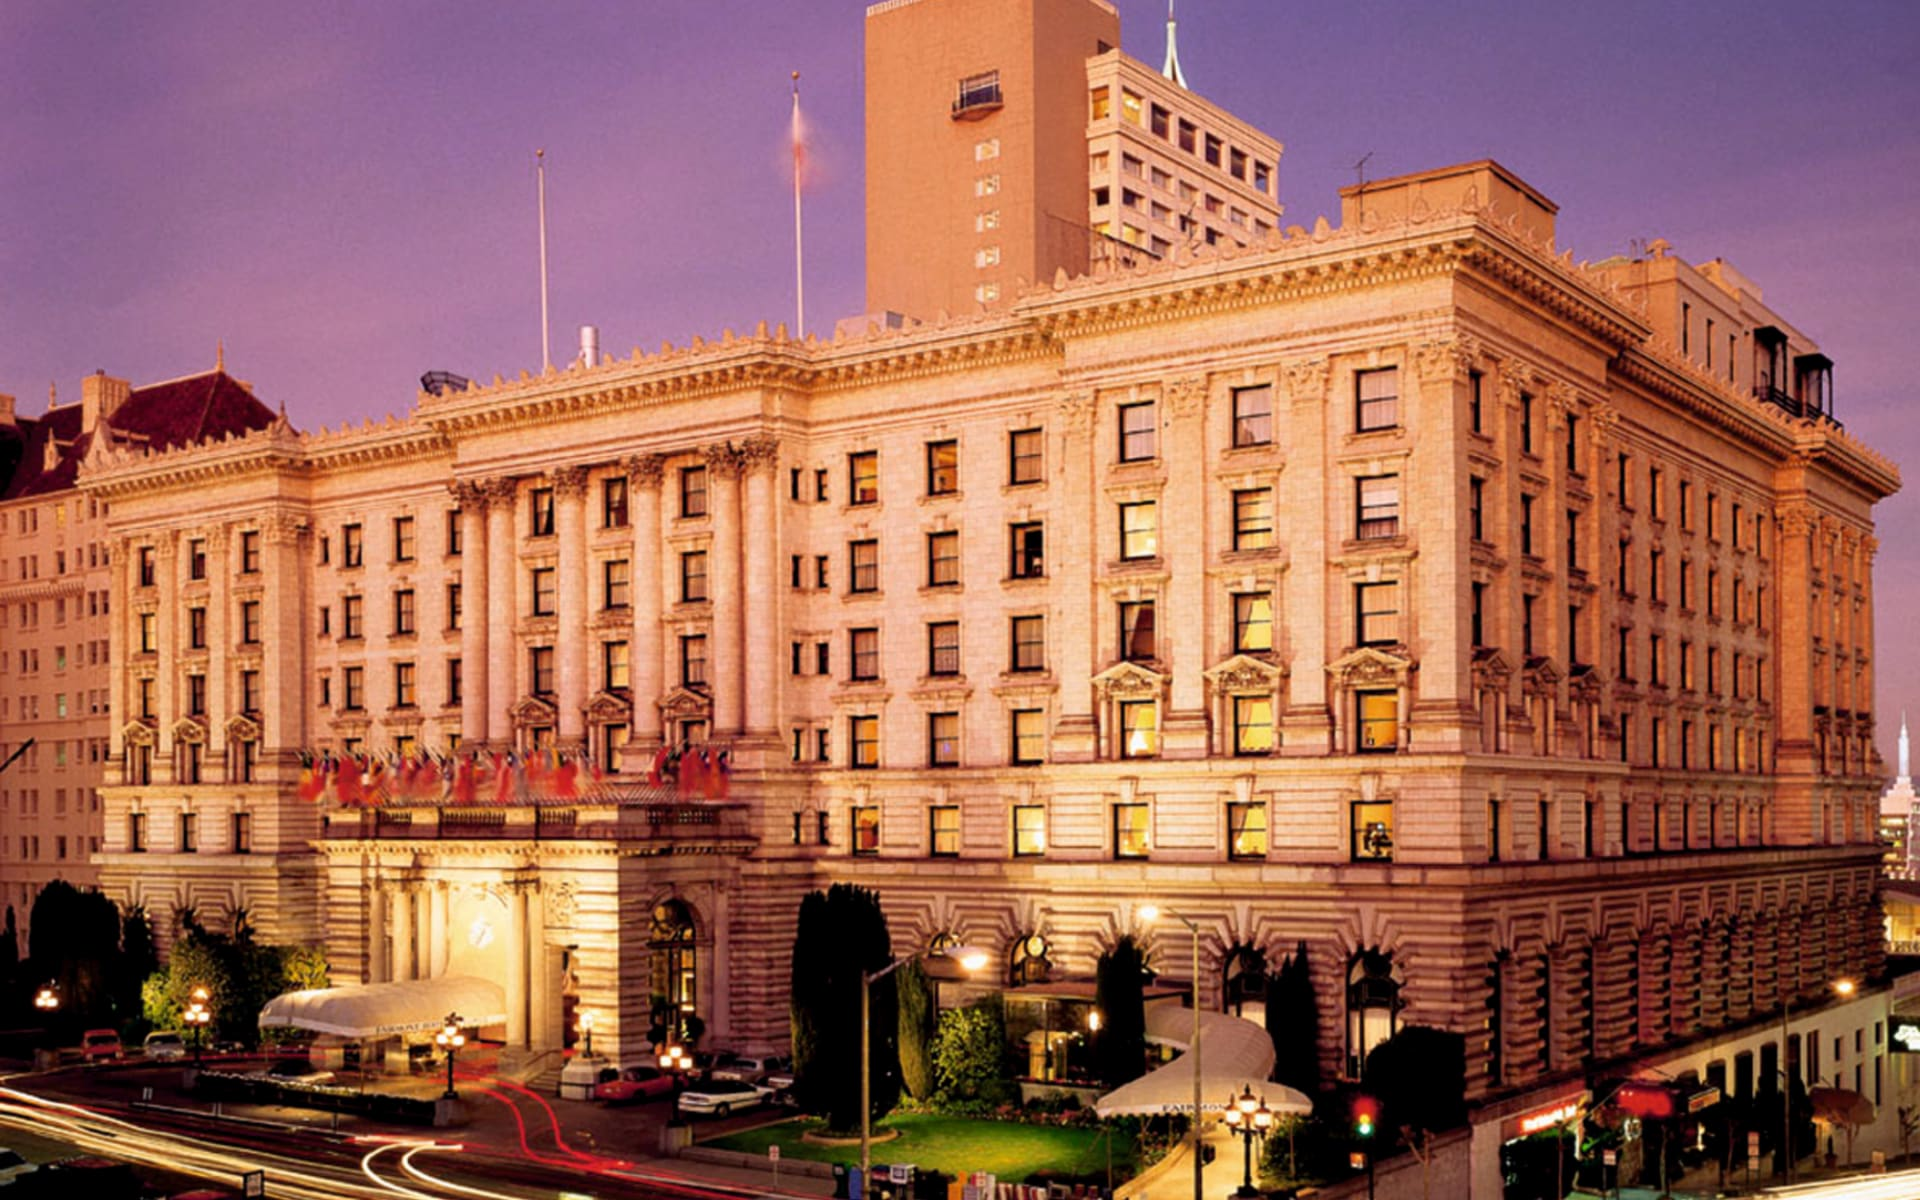 The Fairmont San Francisco Hotel: exterior the fairmont san francisco hotel hotelansicht strasse